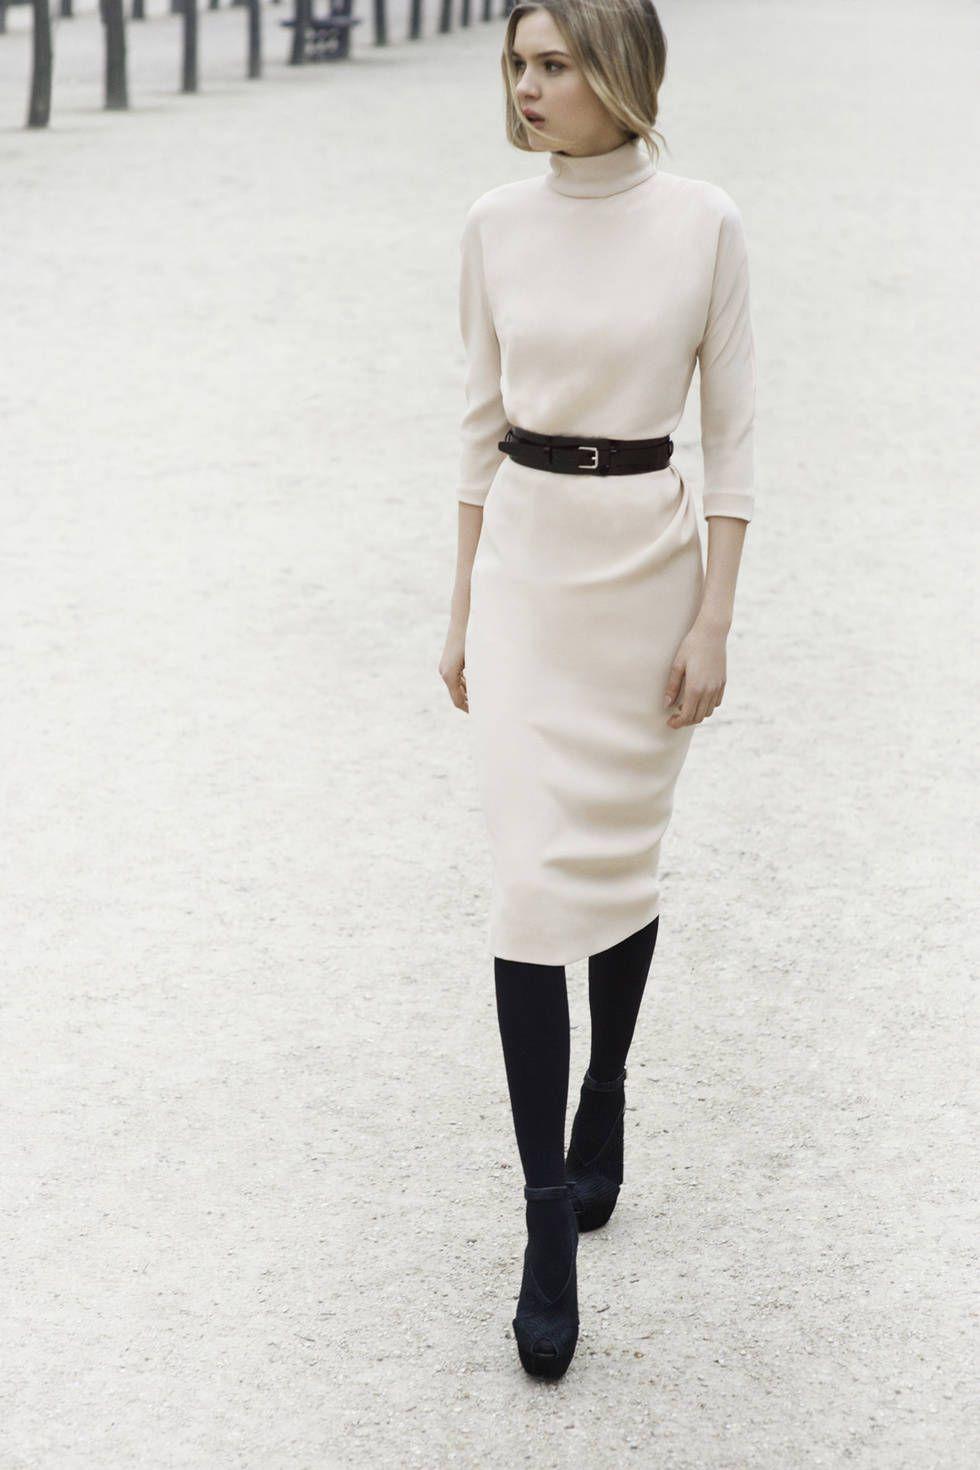 Turtleneck dress vestidos pinterest minimal femininity and